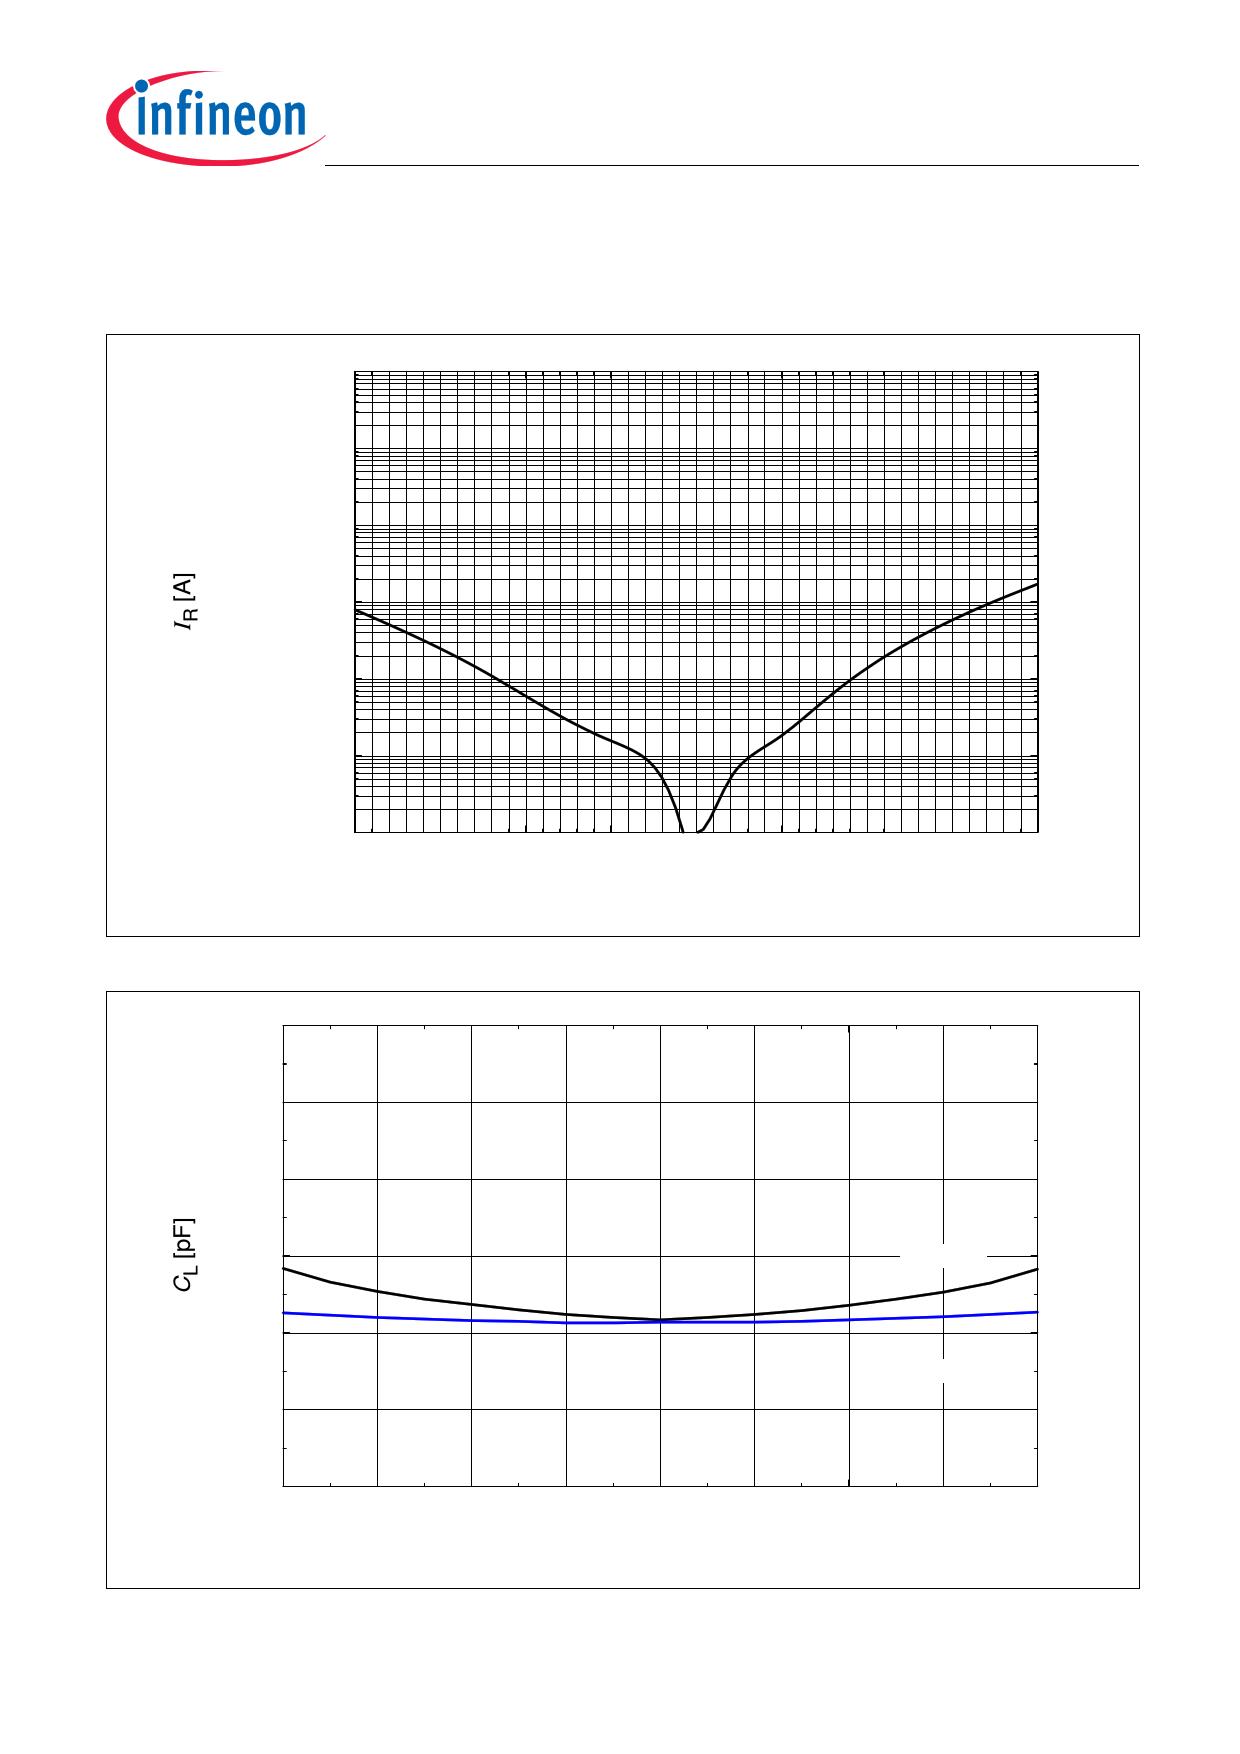 ESD113-B1 電子部品, 半導体